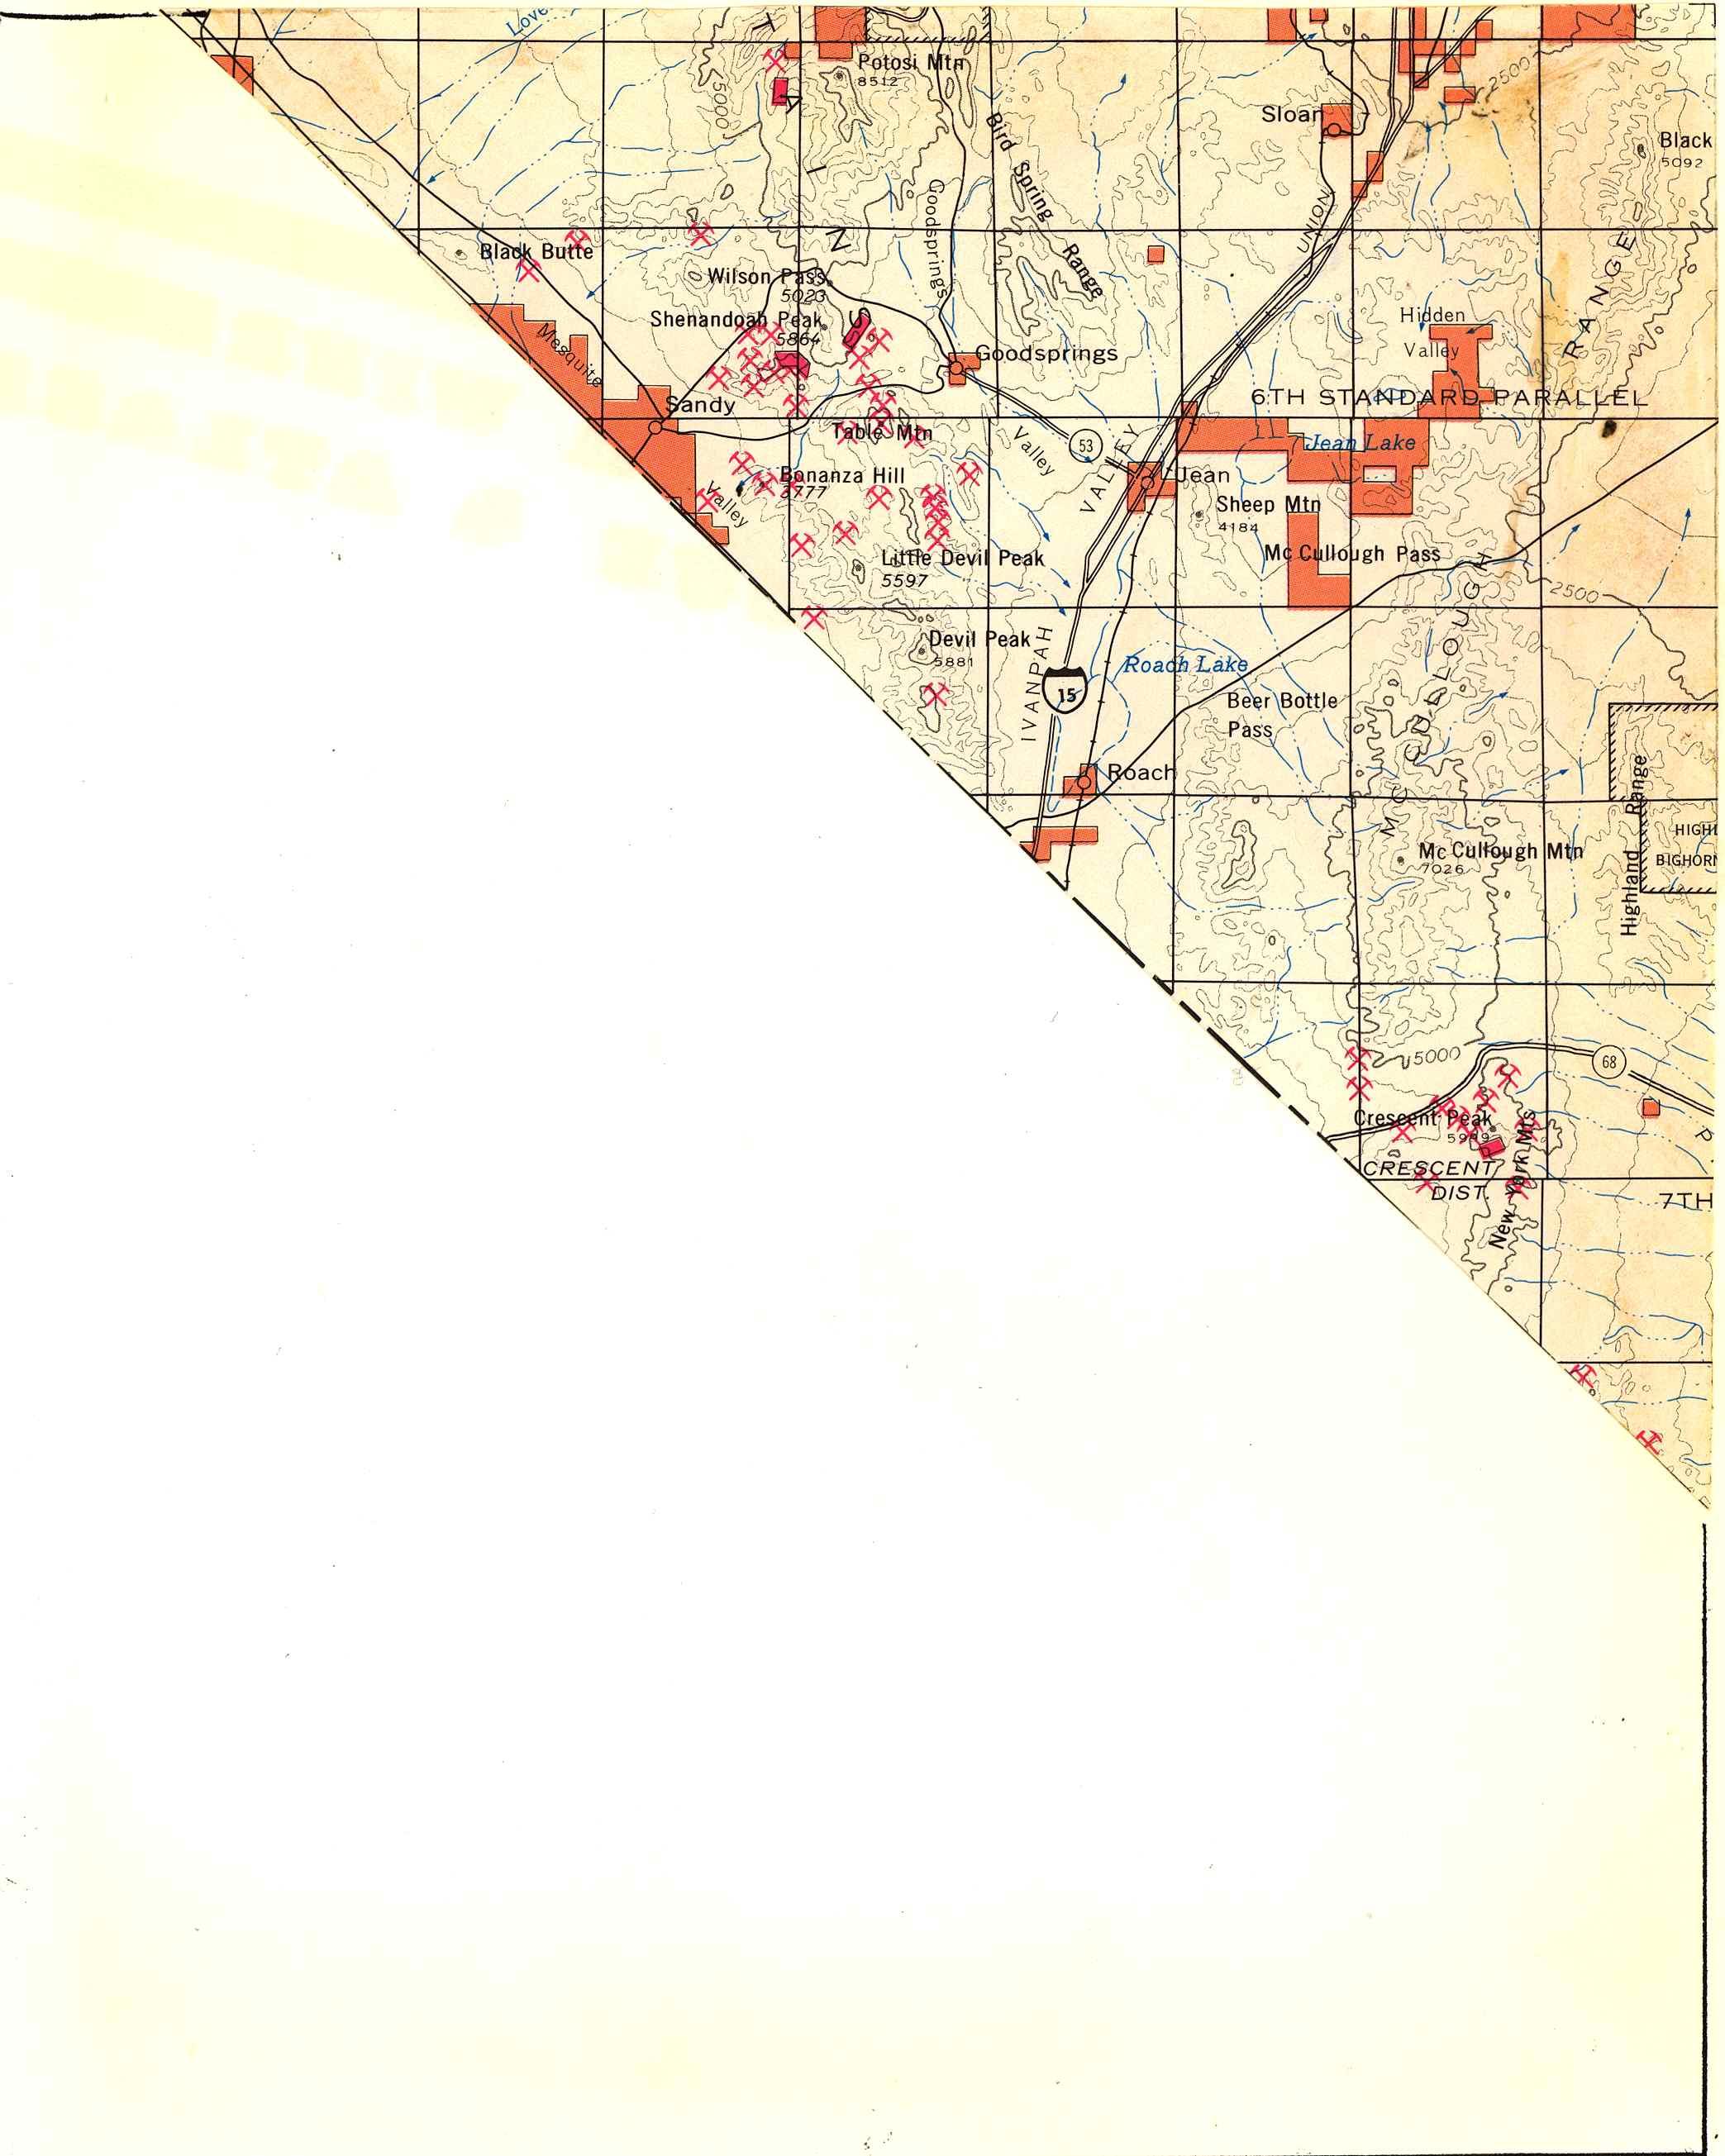 Map [2] 35:115 - Ivanpah - 1972